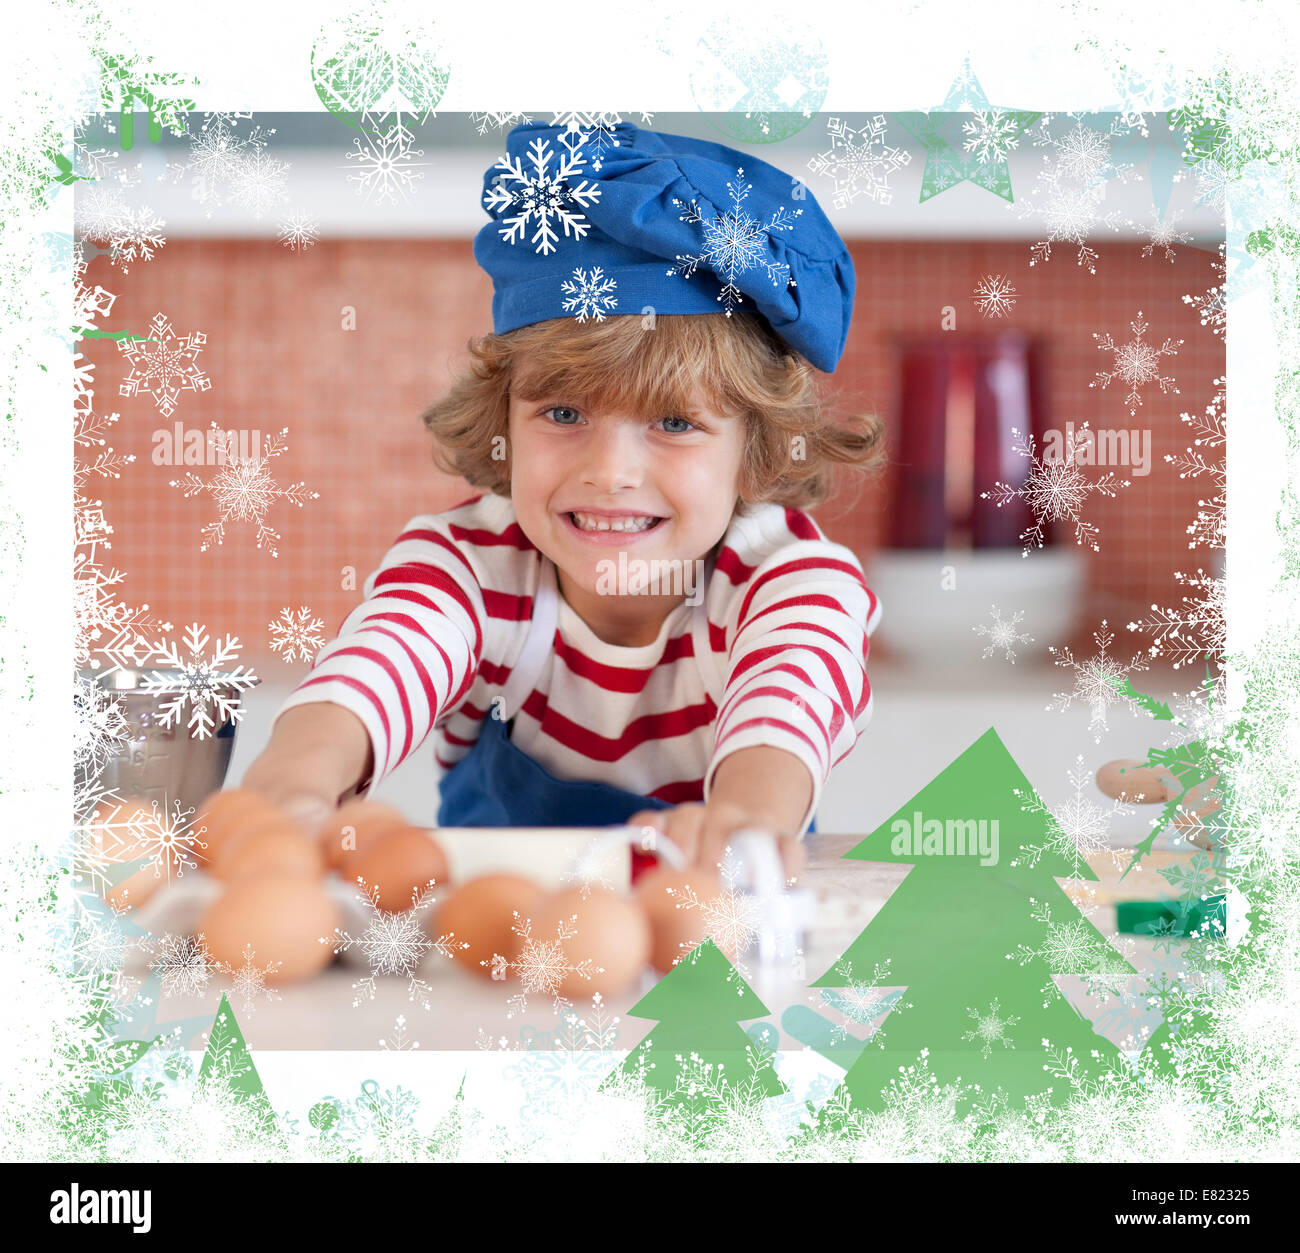 Nice boy baking at home - Stock Image